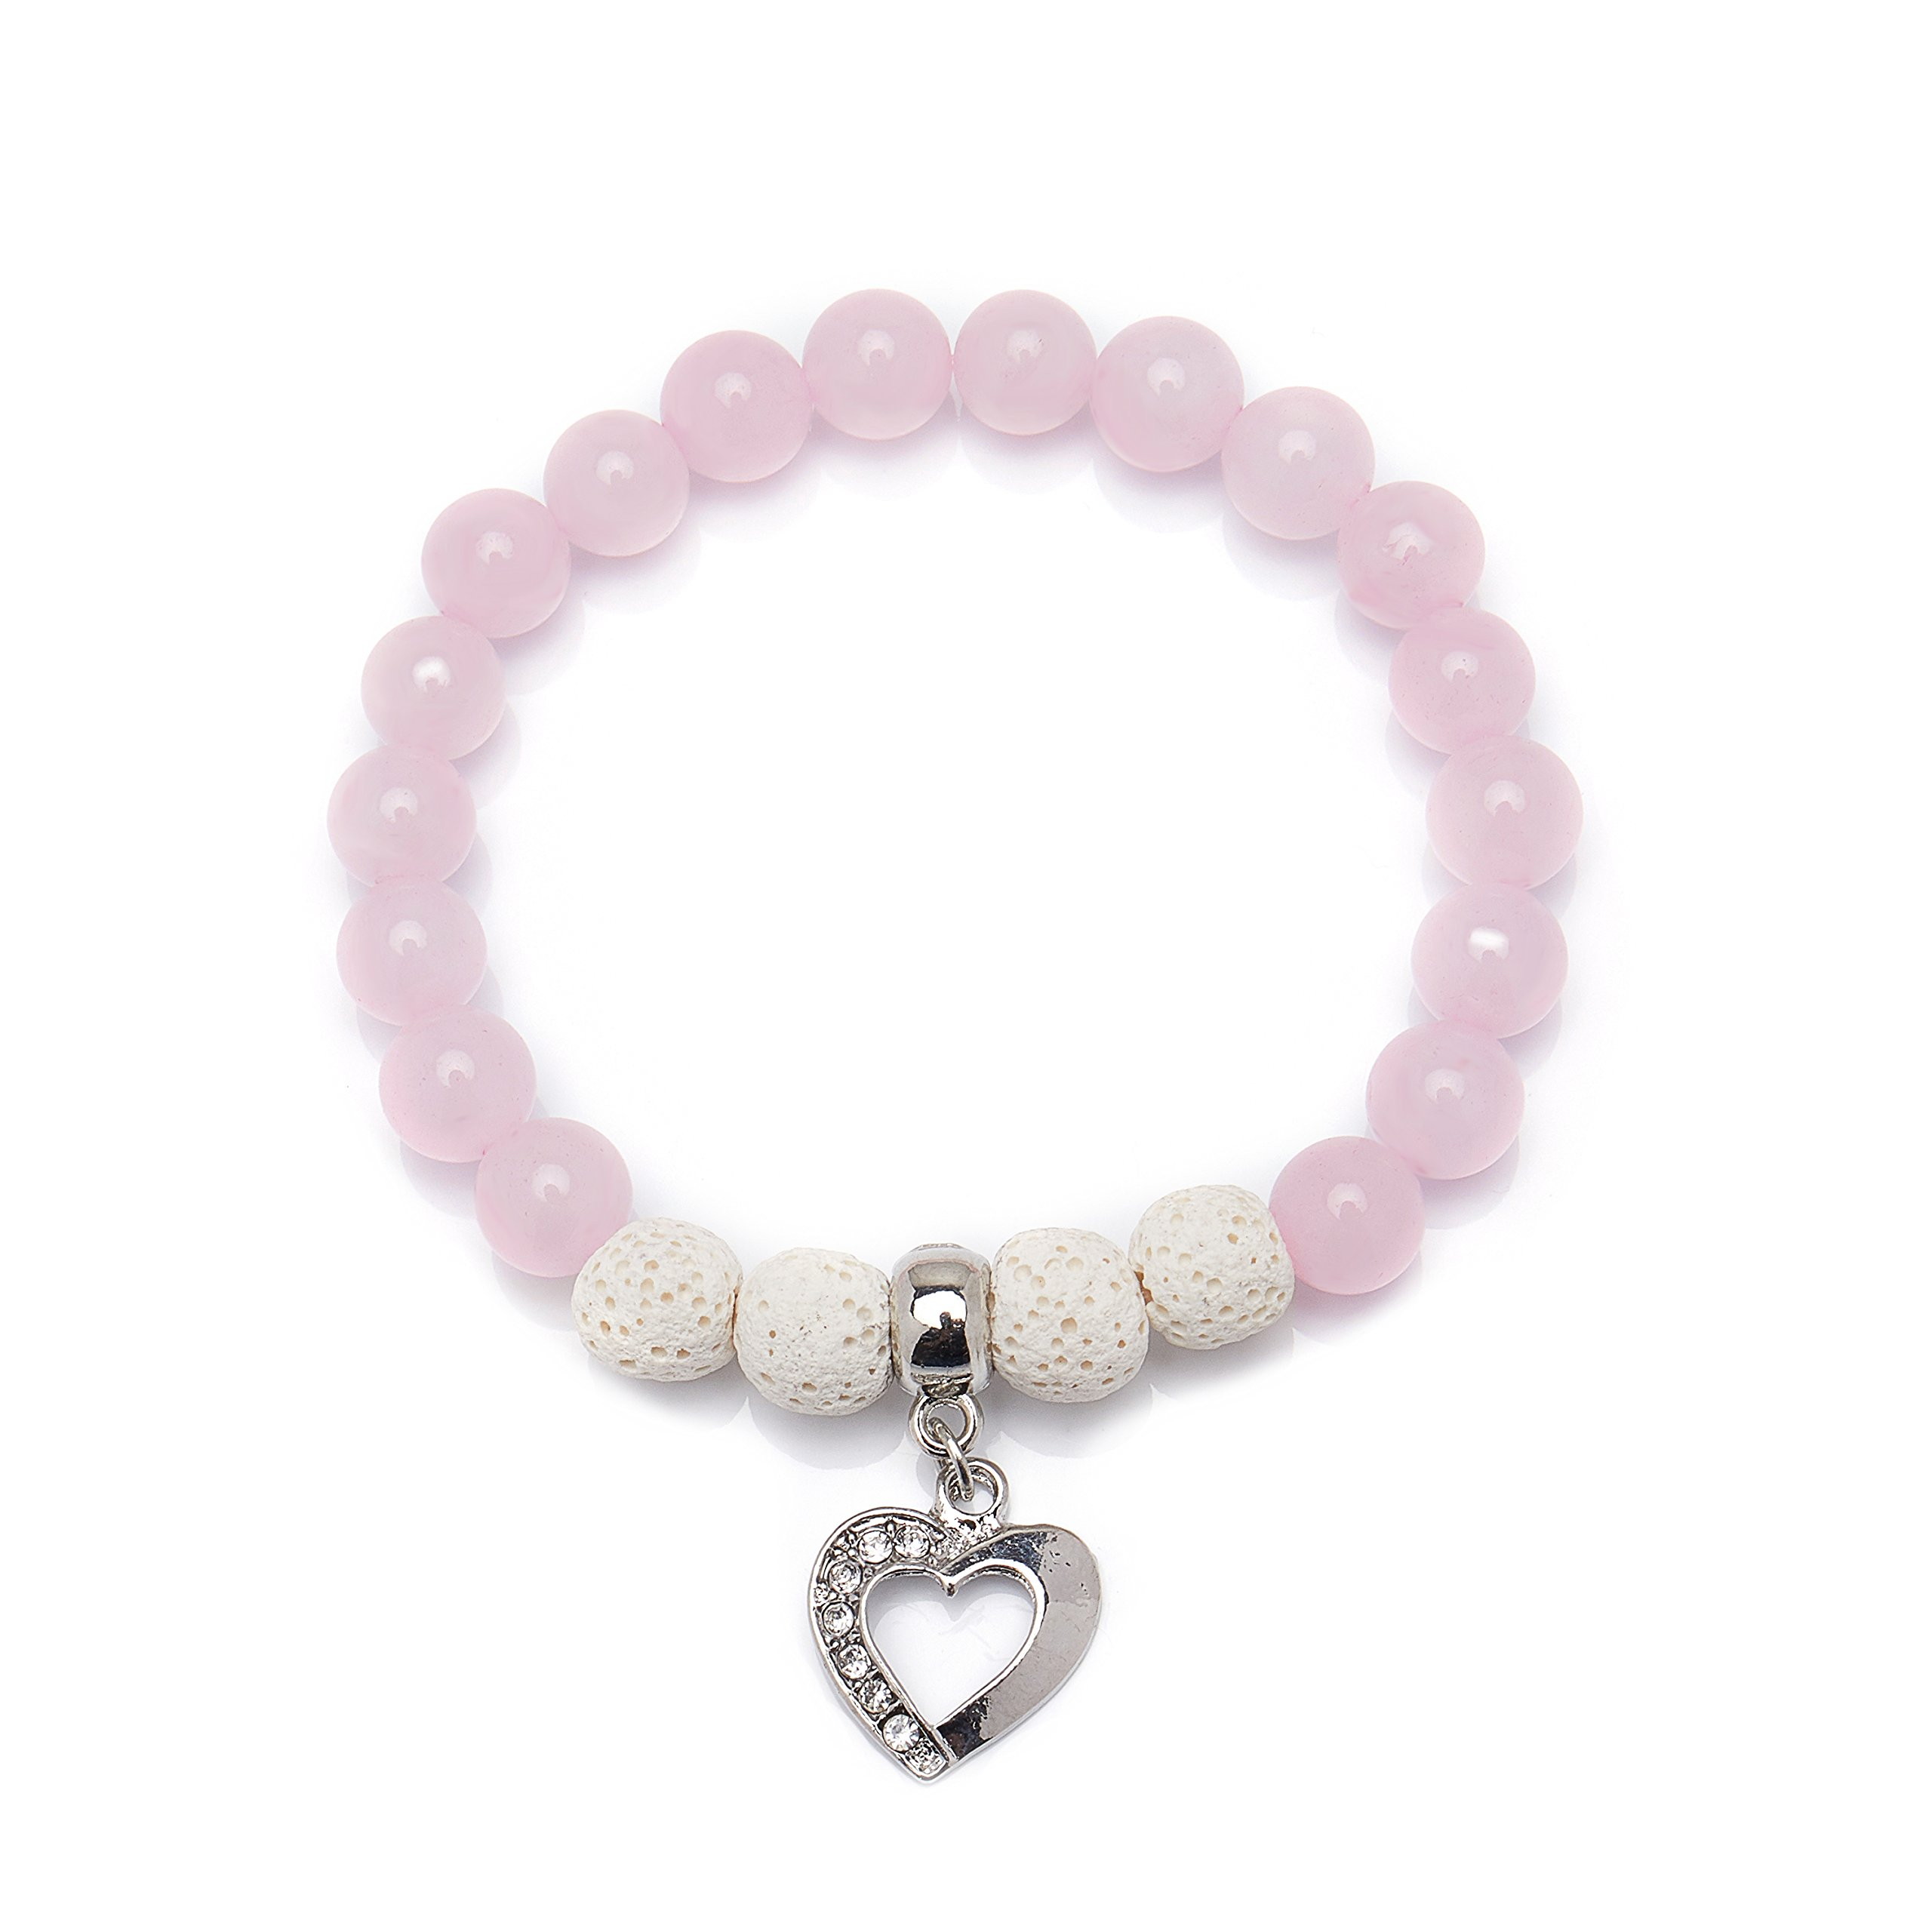 Bivei Lava Rock Stone Essential Oil Diffuser Bracelet Heart Love Women Gemstone Round Beads Crystal Bracelet(Rose Quartz)